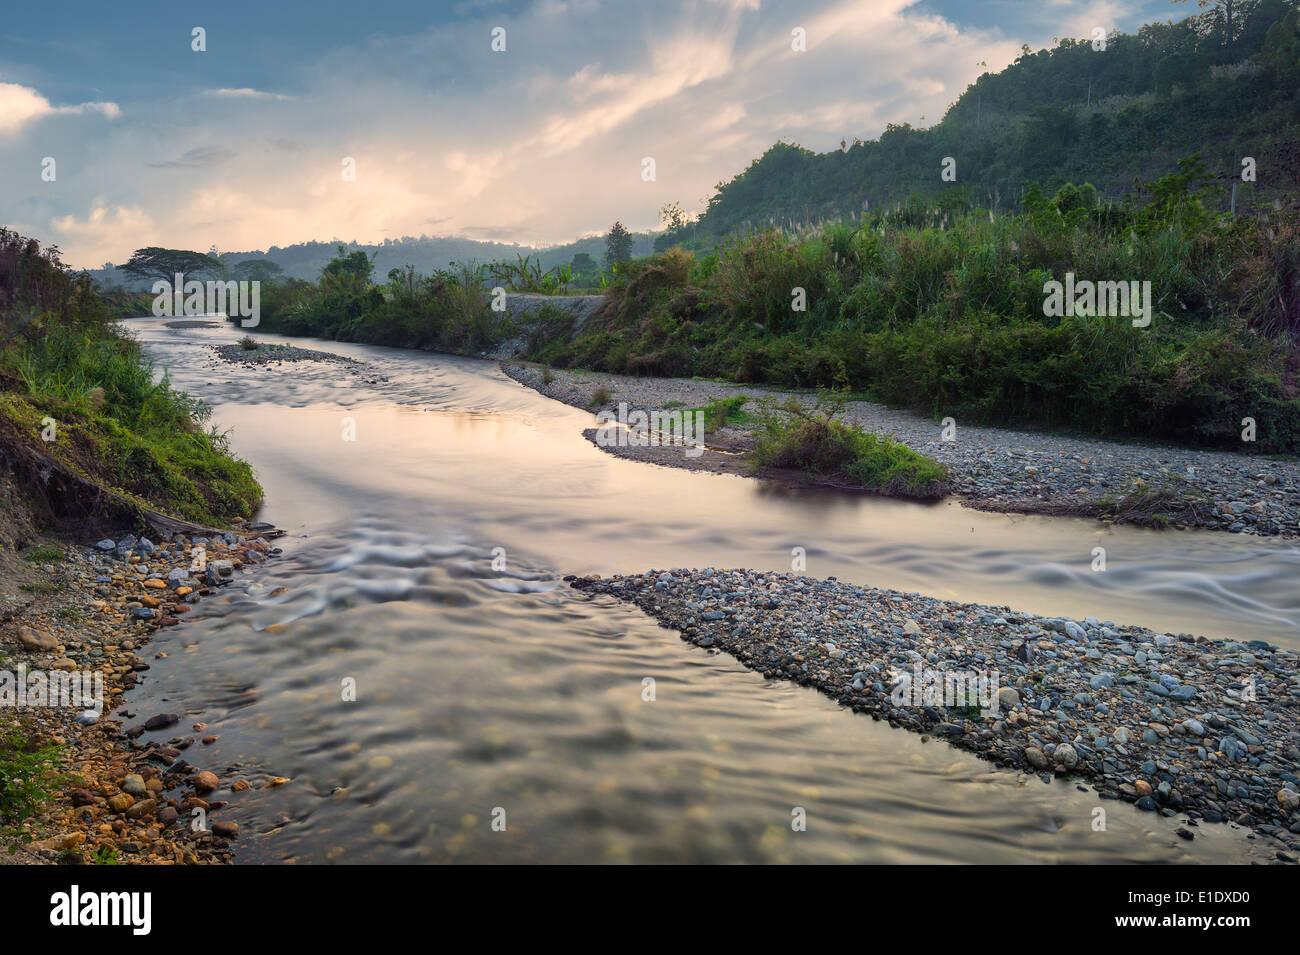 urban river - Stock Image